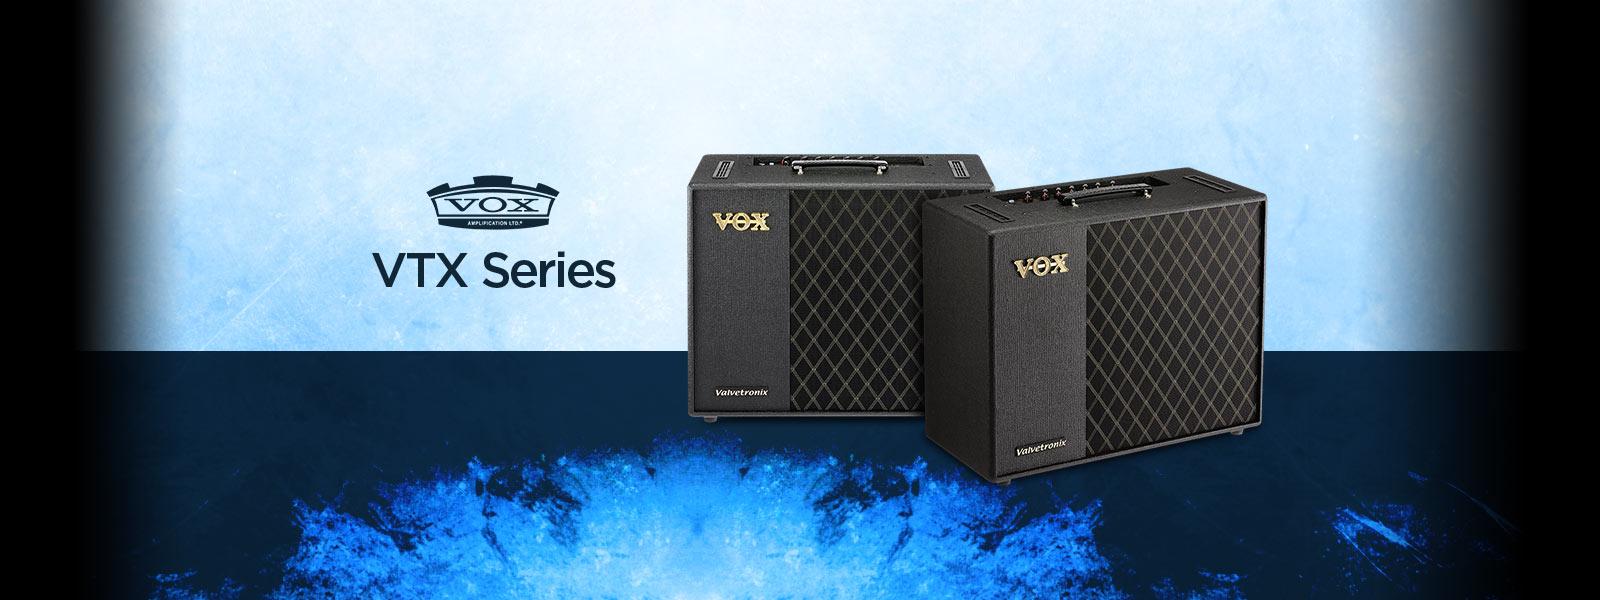 VOX VTX Series Amplifiers